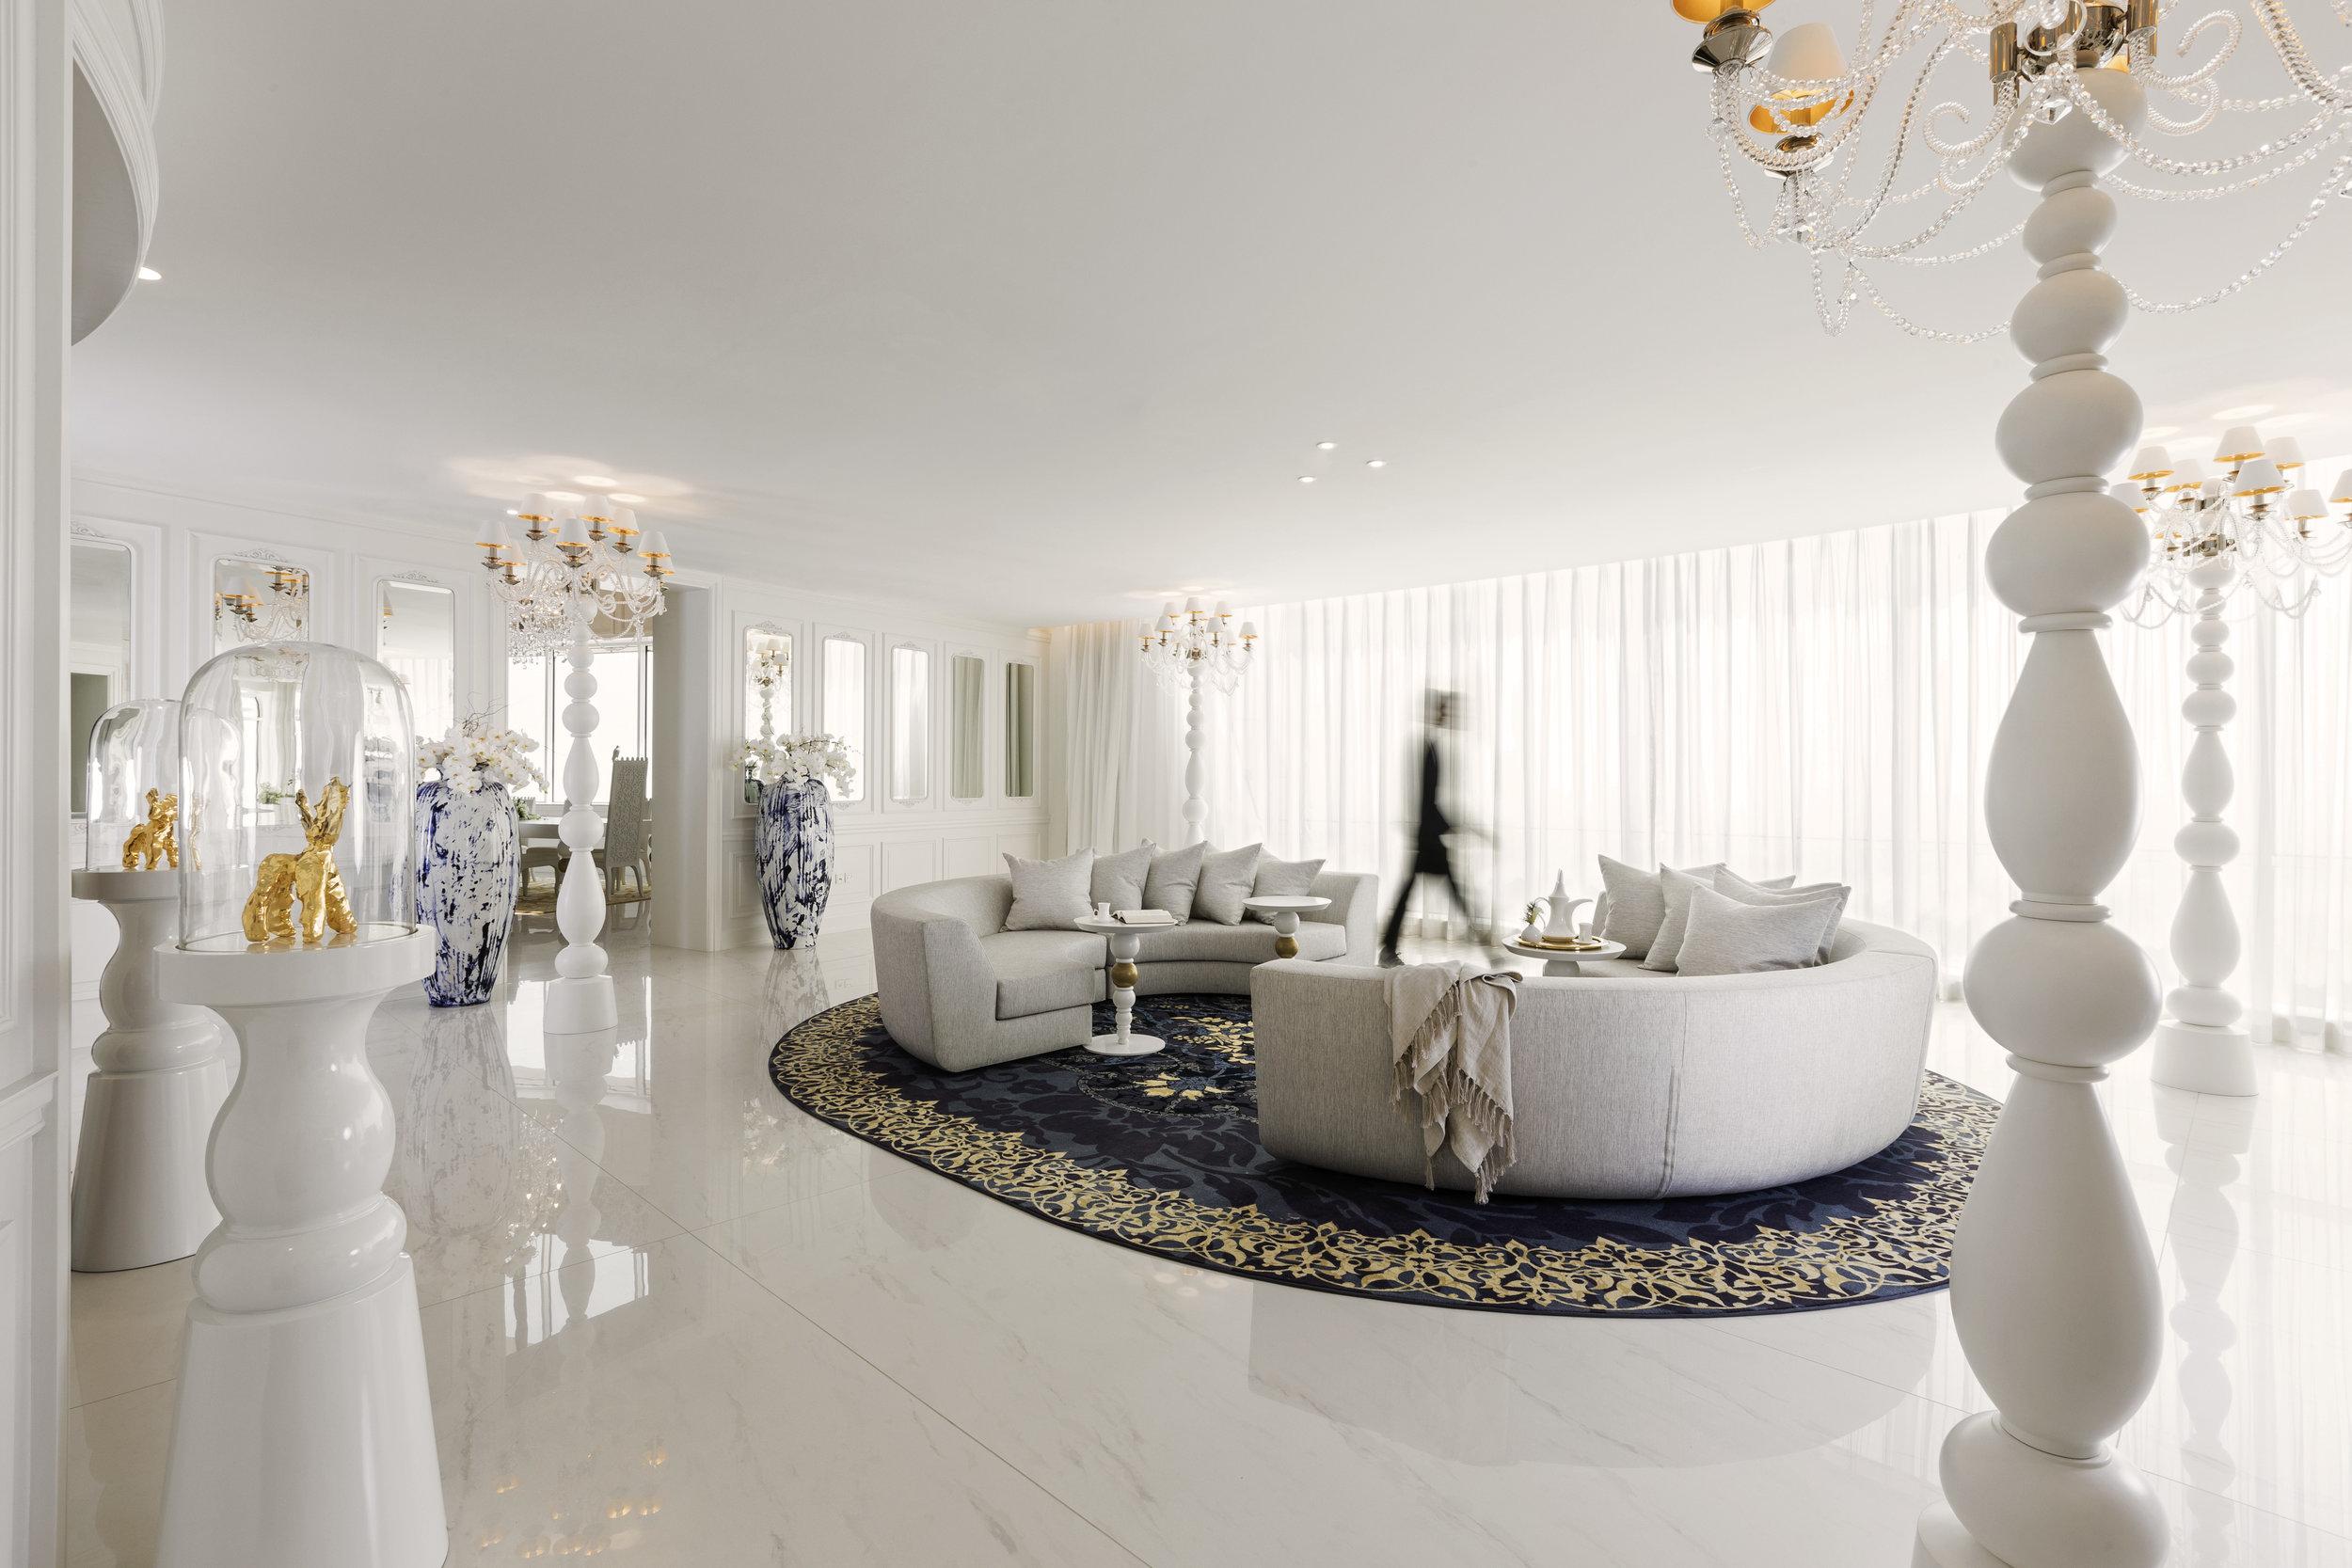 MW_MondrianDoha_Penthouse_03.jpg